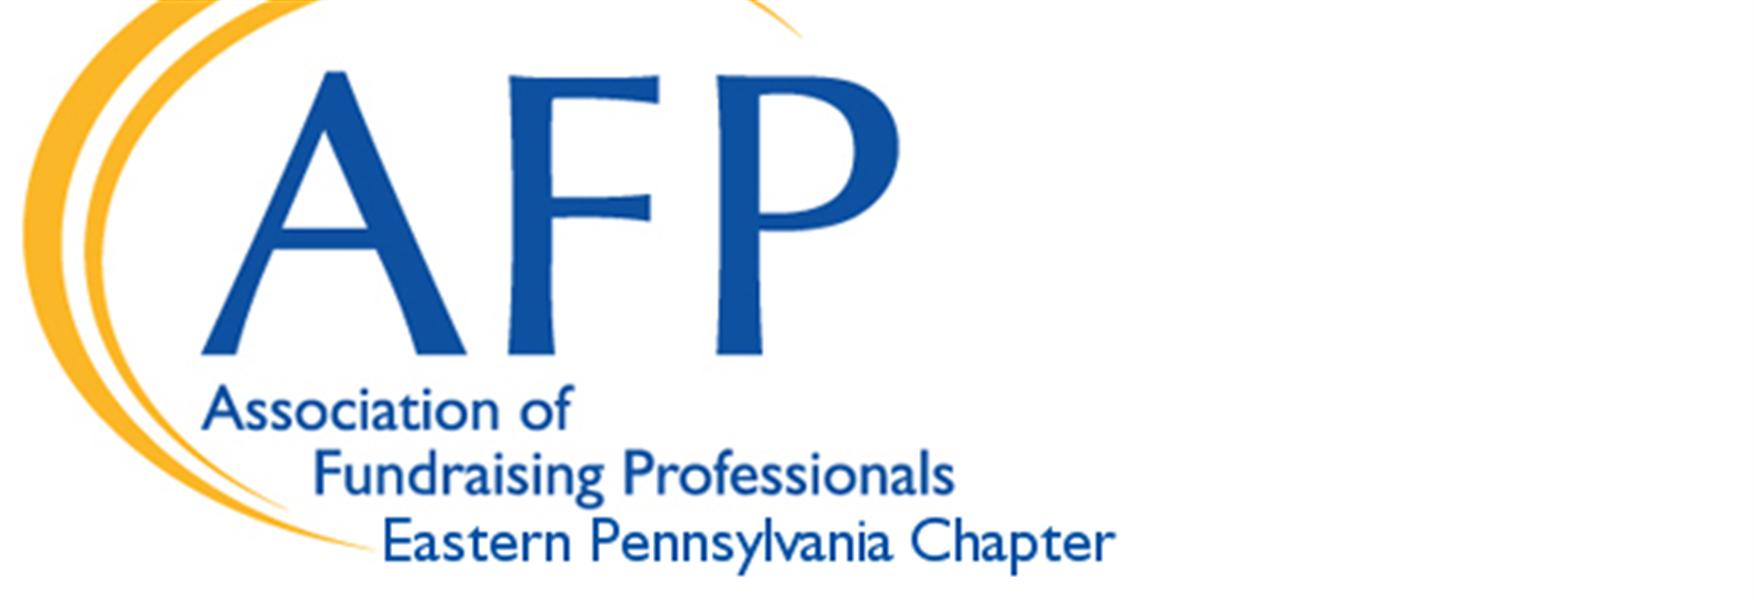 57f9cd02-2939-4074-b609-1836fcc11ca1_AFP - EPA Logo.php.png